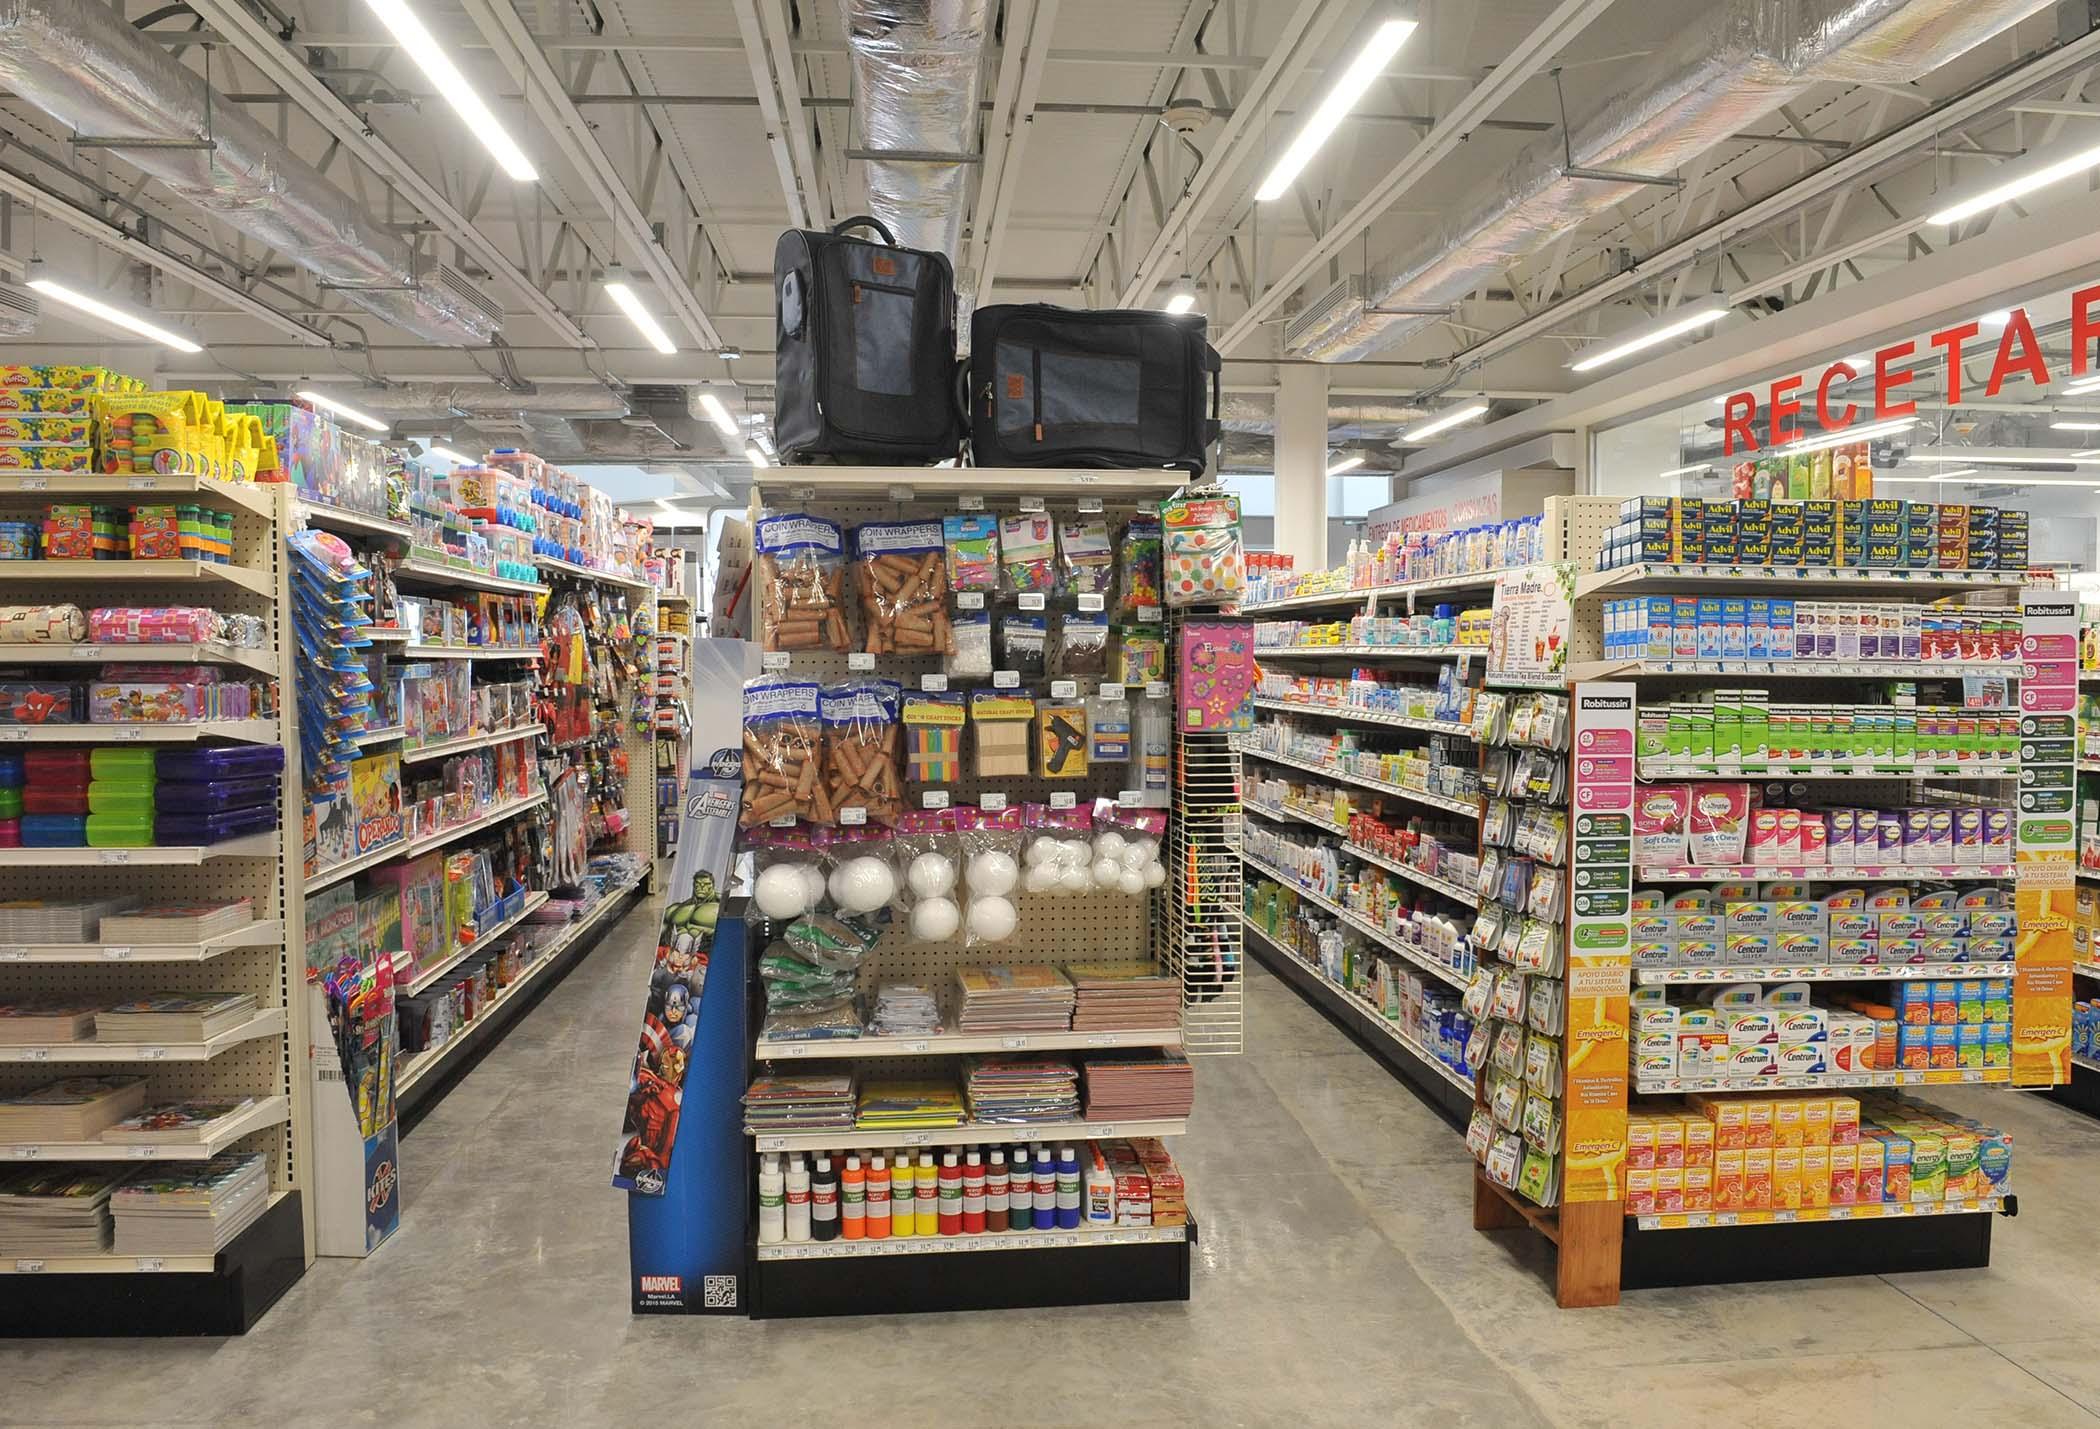 Inauguracion_Farmacias_Plaza-Plaza_del_Sol-10.jpg